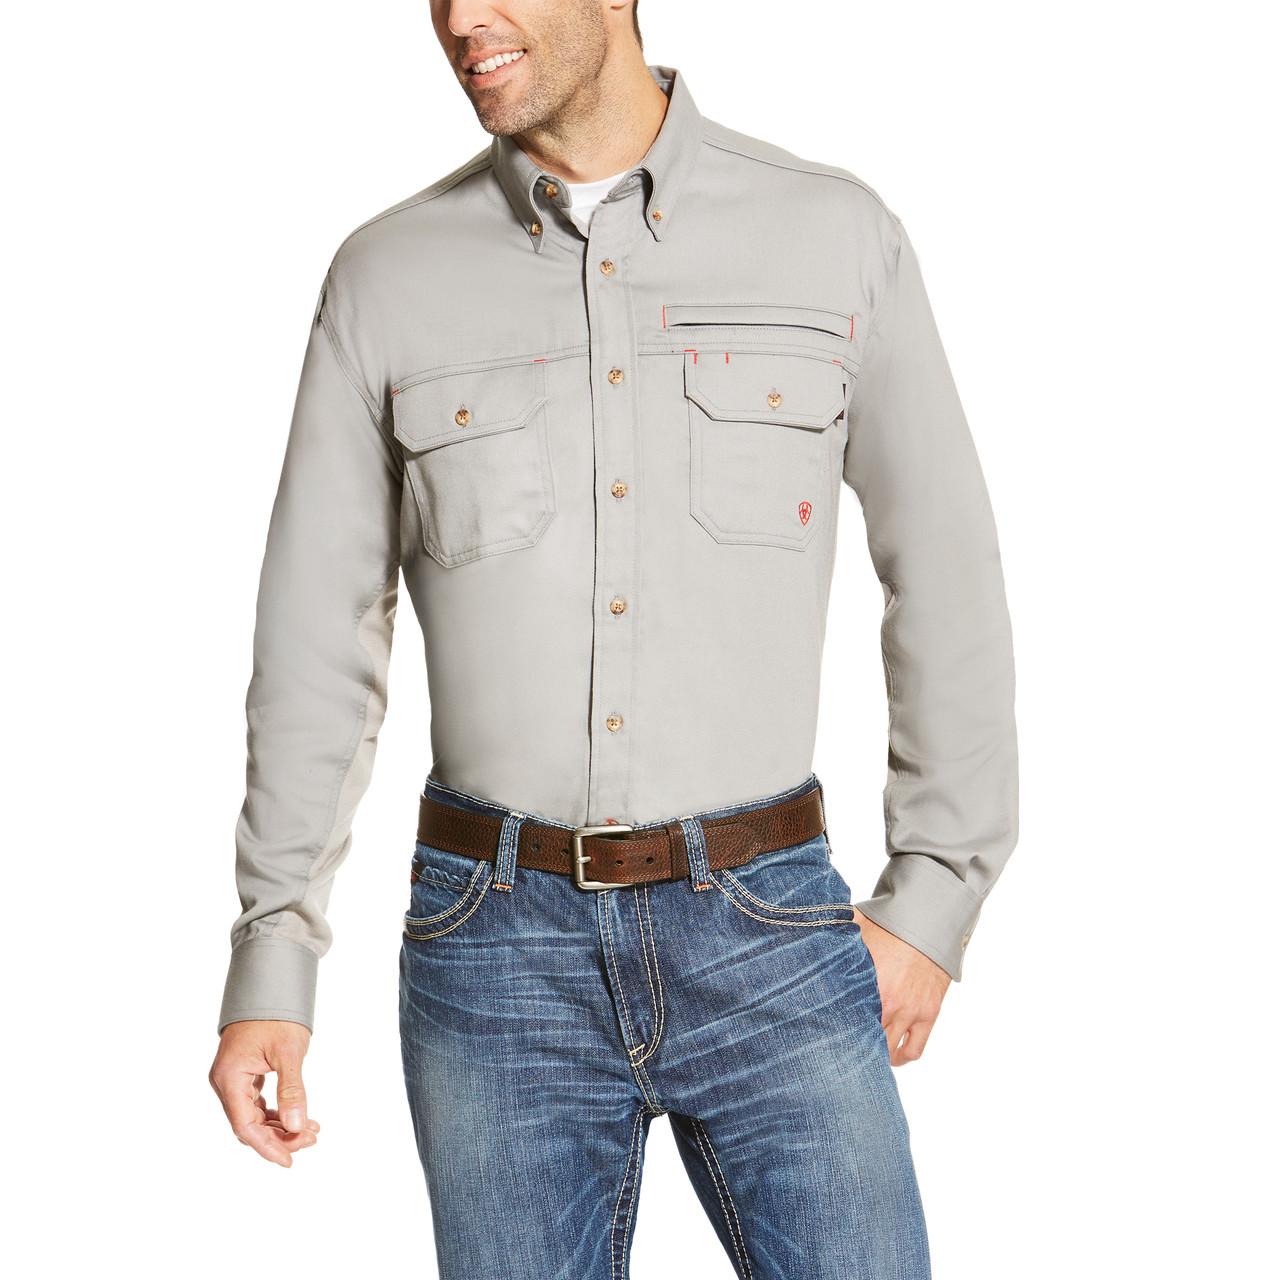 Ariat Men s FR Solid Vent Work Shirt - Silver Fox - Billy s Western Wear 468d5fce65cc